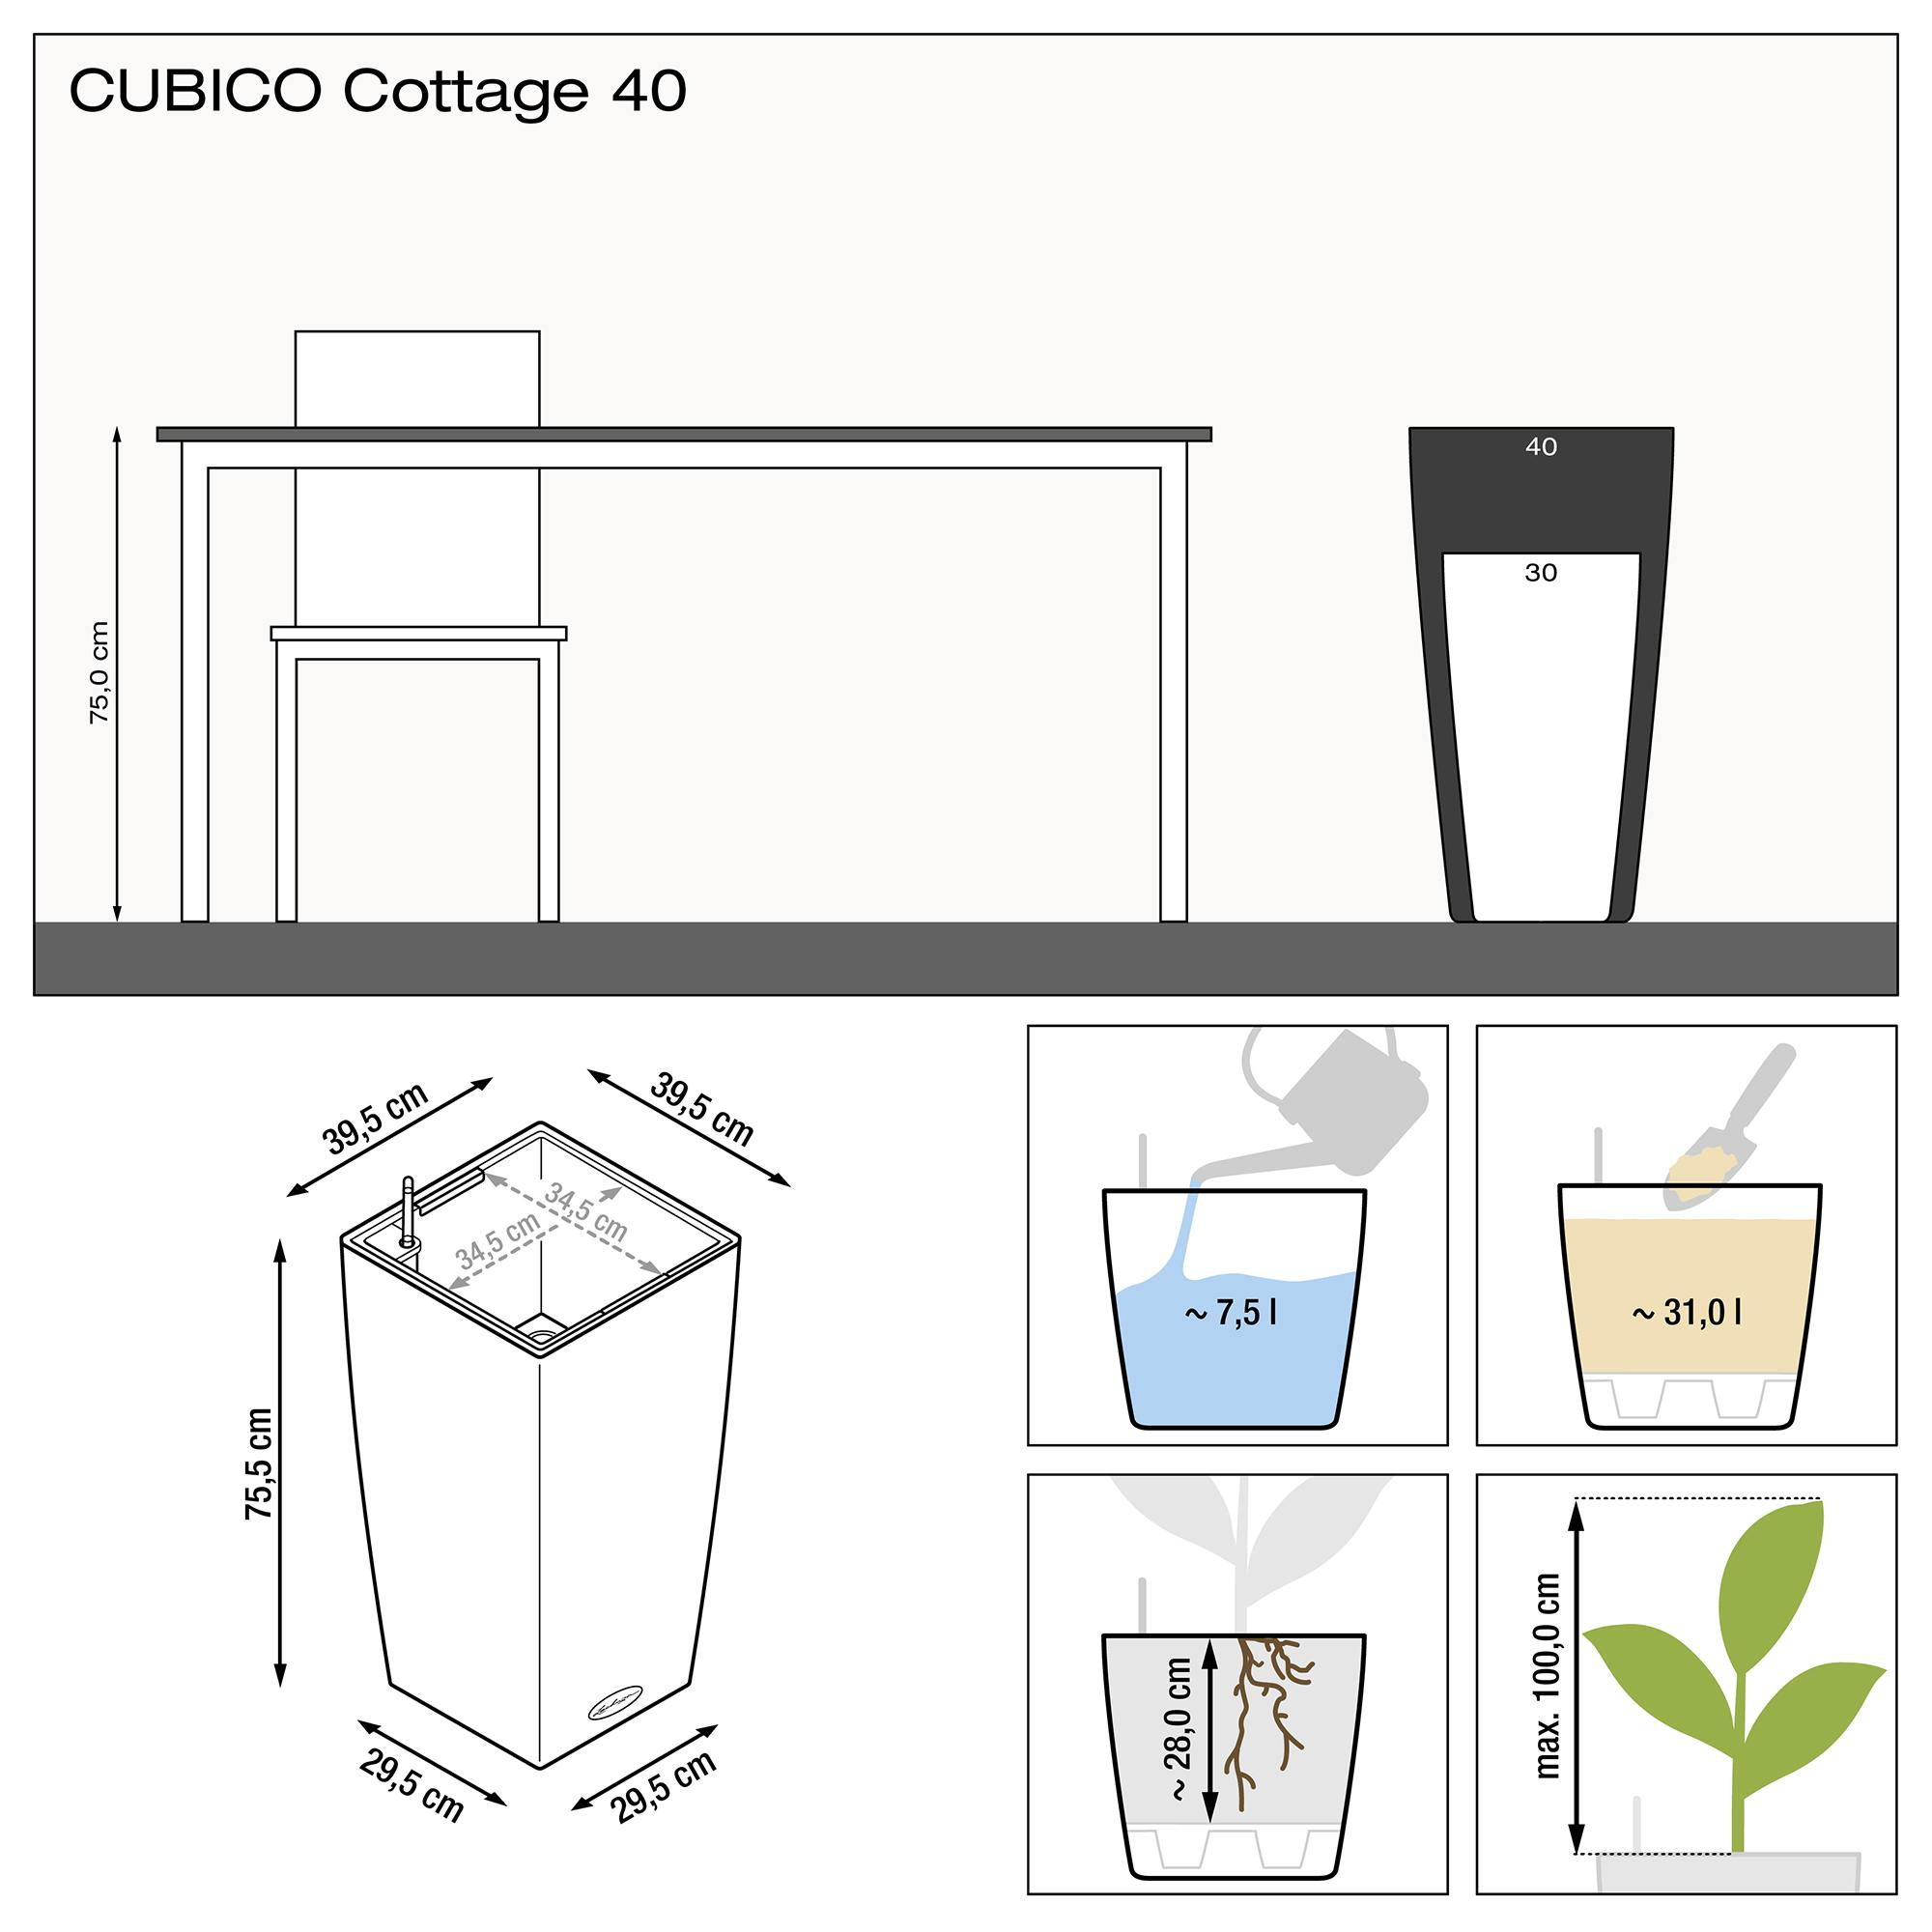 CUBICO Cottage 40 moca - Imagen 3